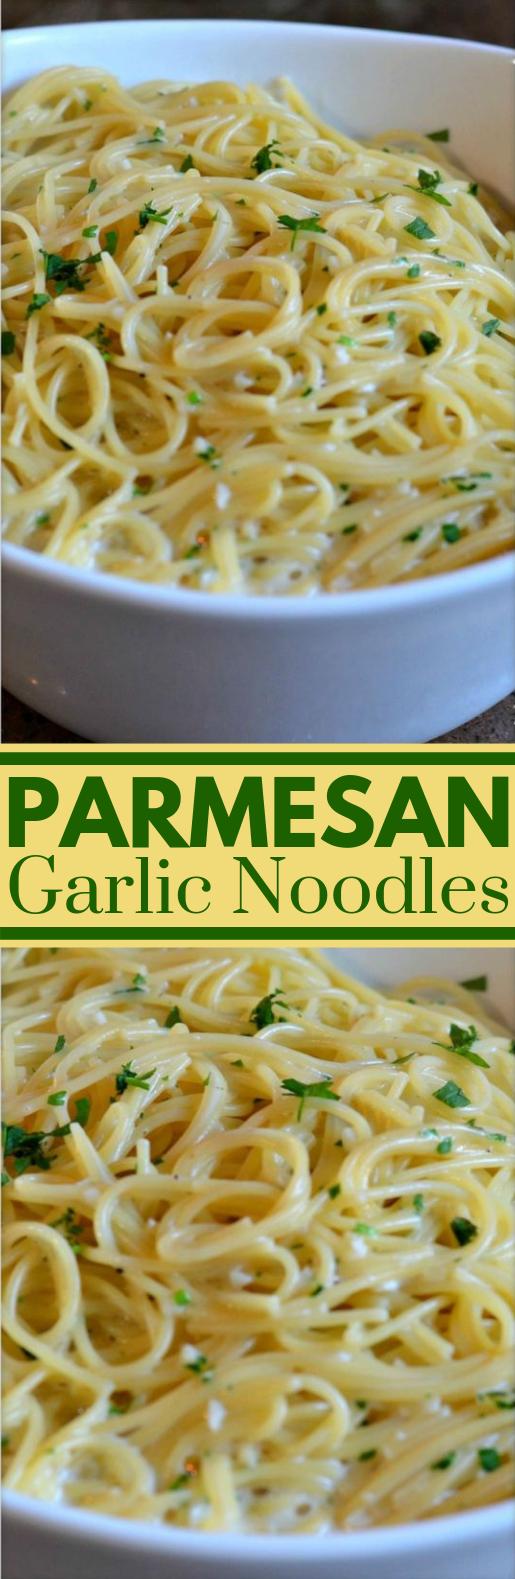 Parmesan Garlic Noodles #Dinner #SimpleRecipe